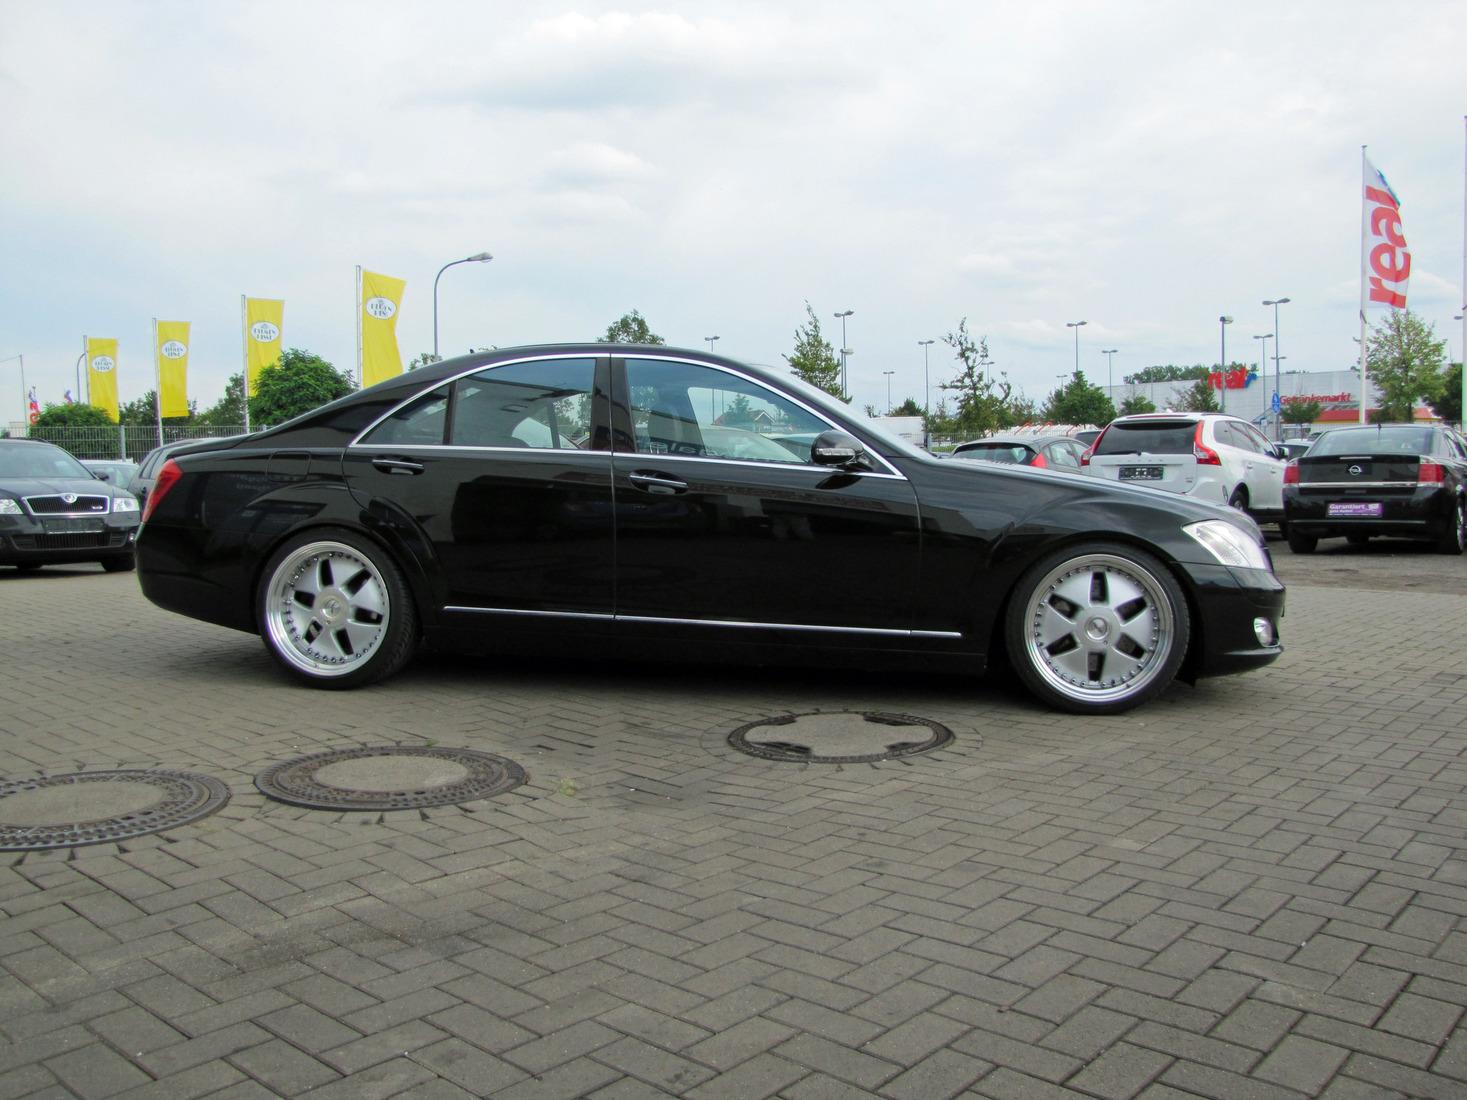 Sondereintragung Keskin Kt5 Felgen Mercedes S Klasse Sat